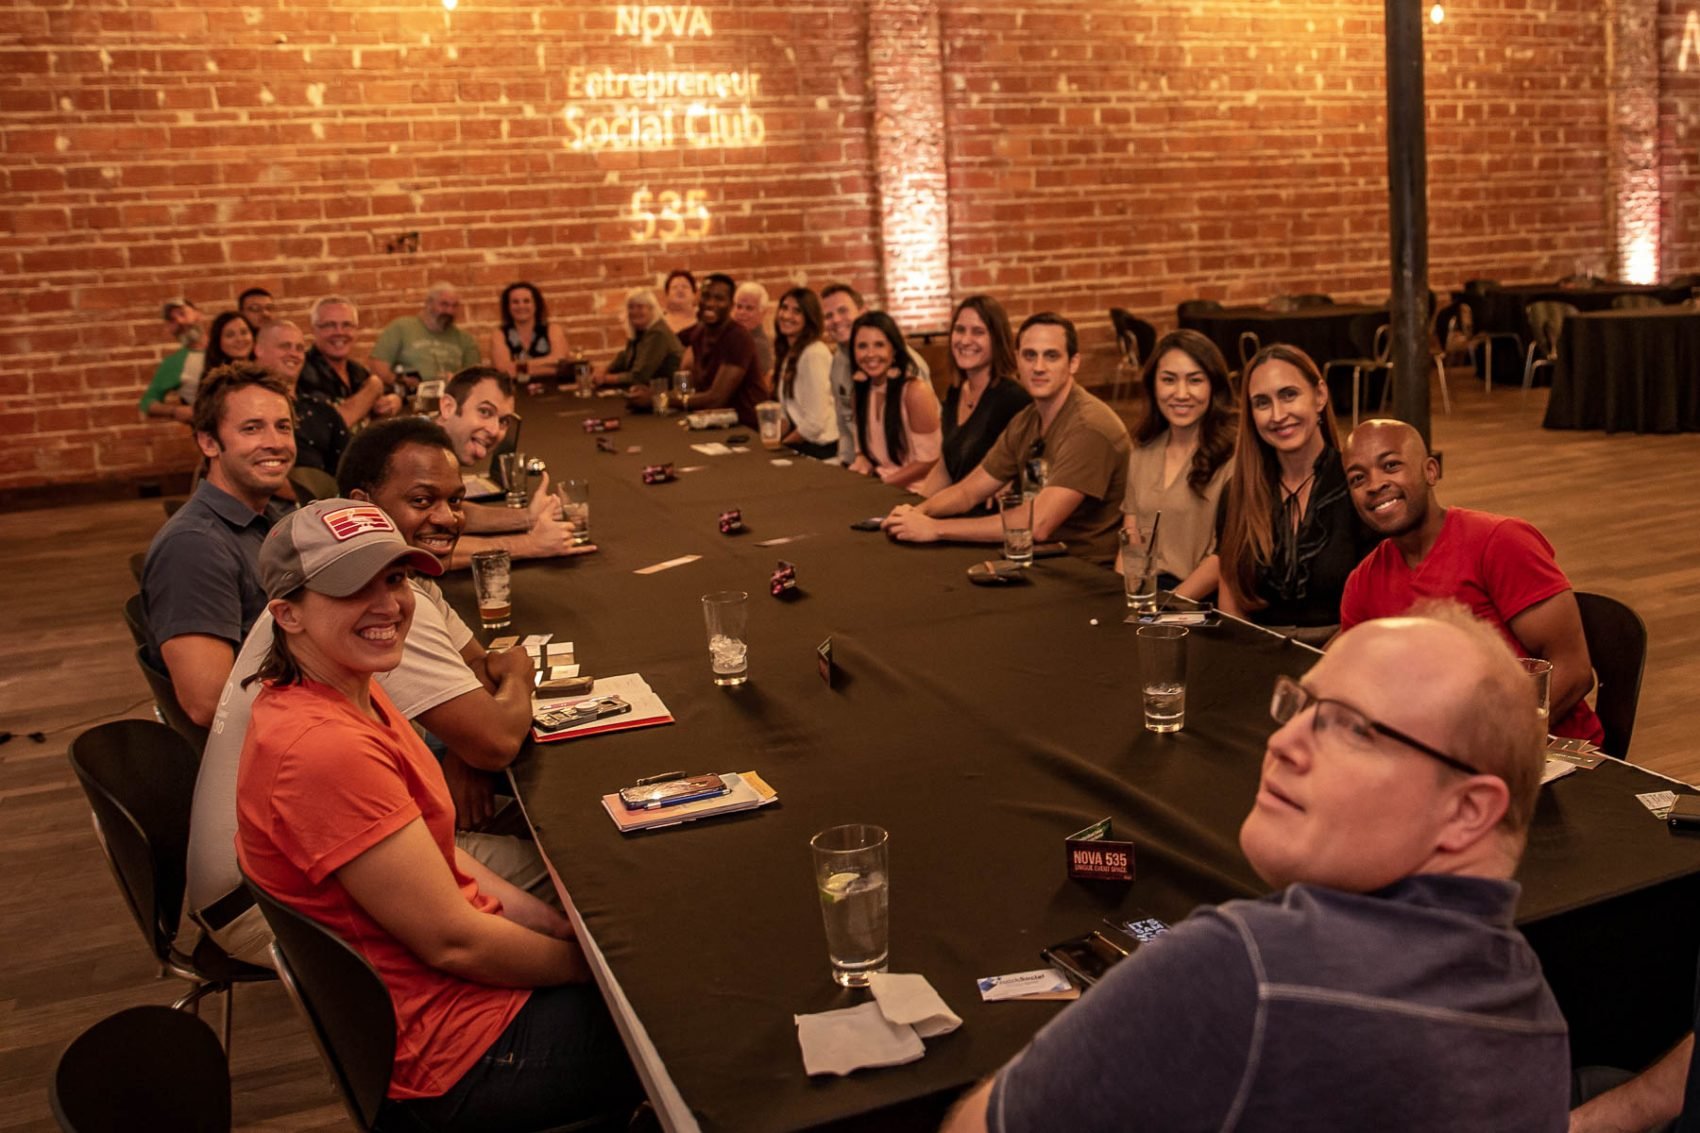 2019 10-24 Entrepreneur Social Club at historic Downtown St. Pete venue NOVA 535